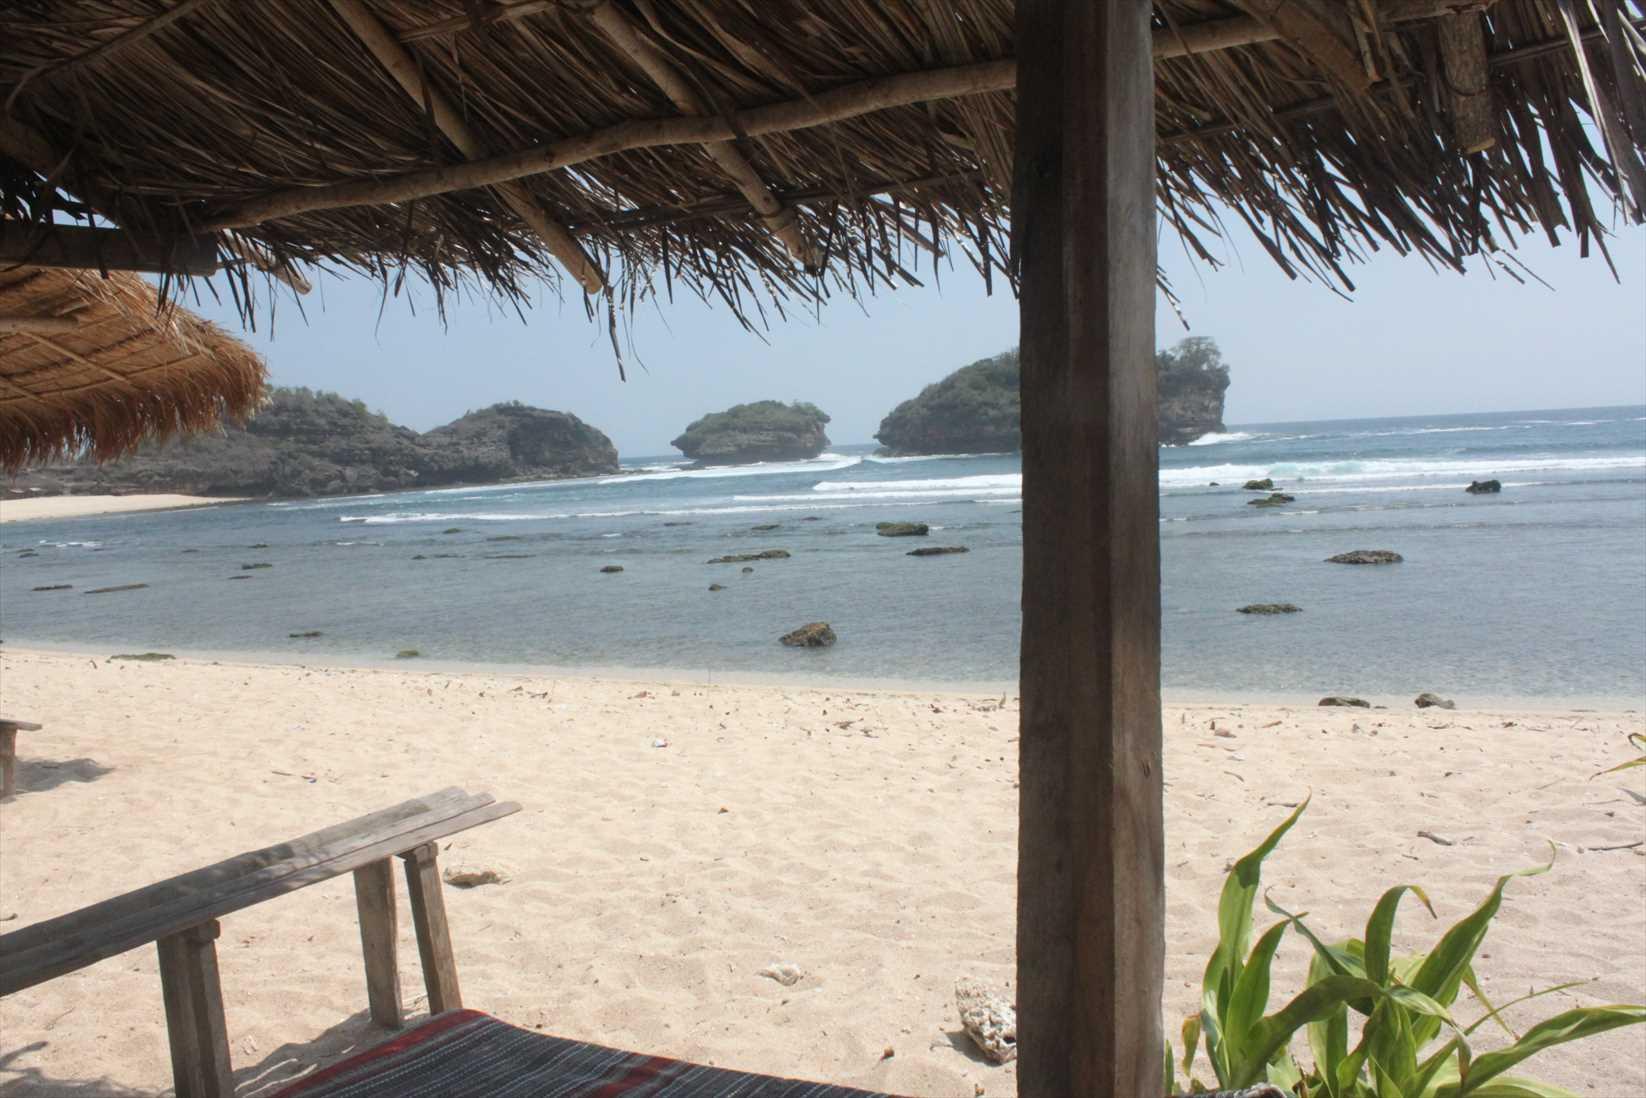 Pantai Watu Karung 1